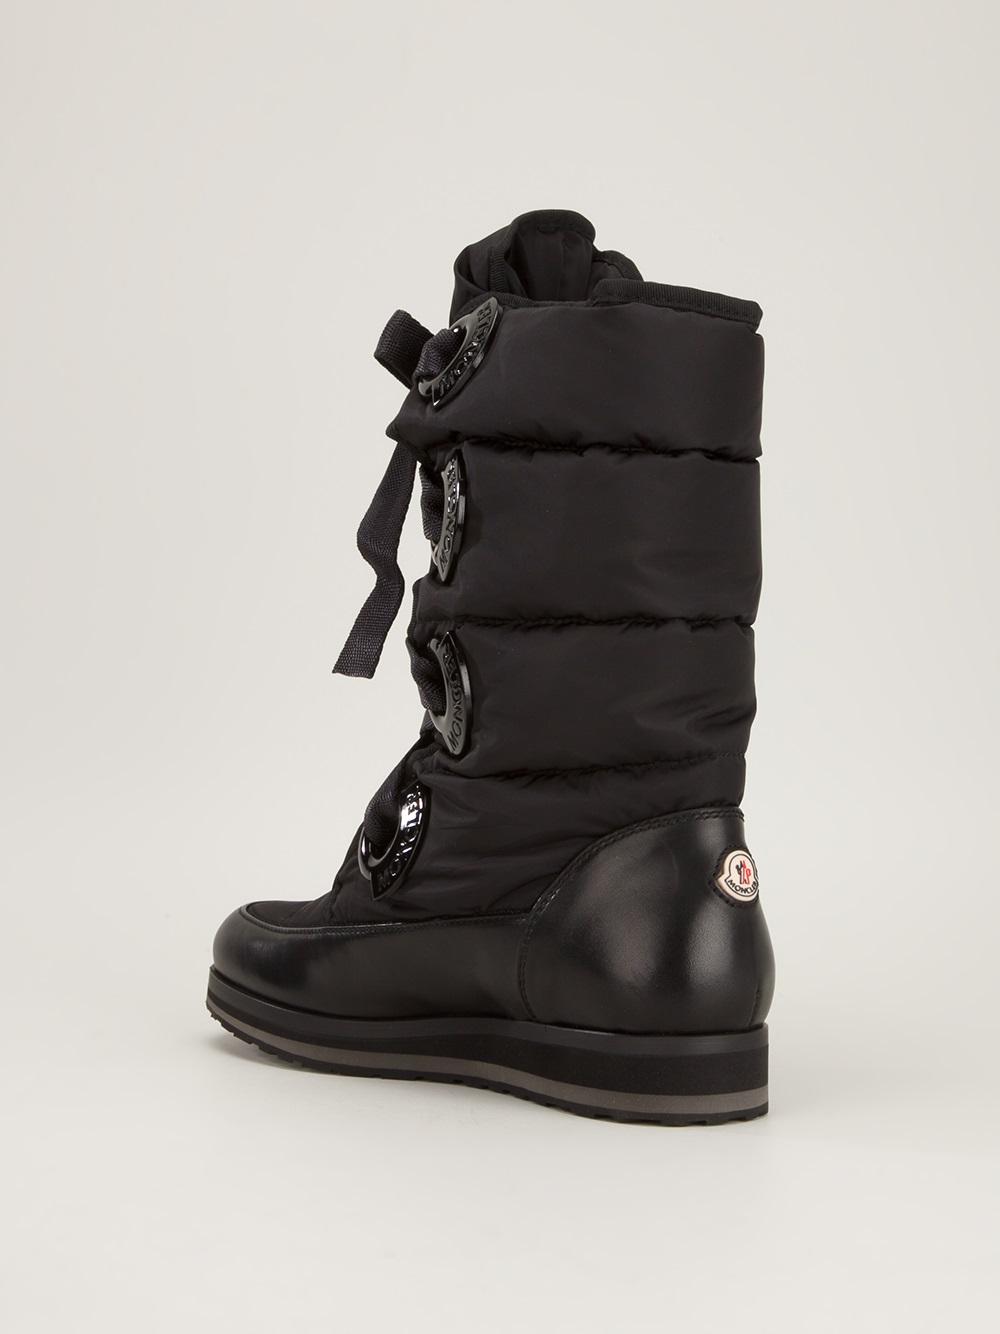 buty śniegowce moncler